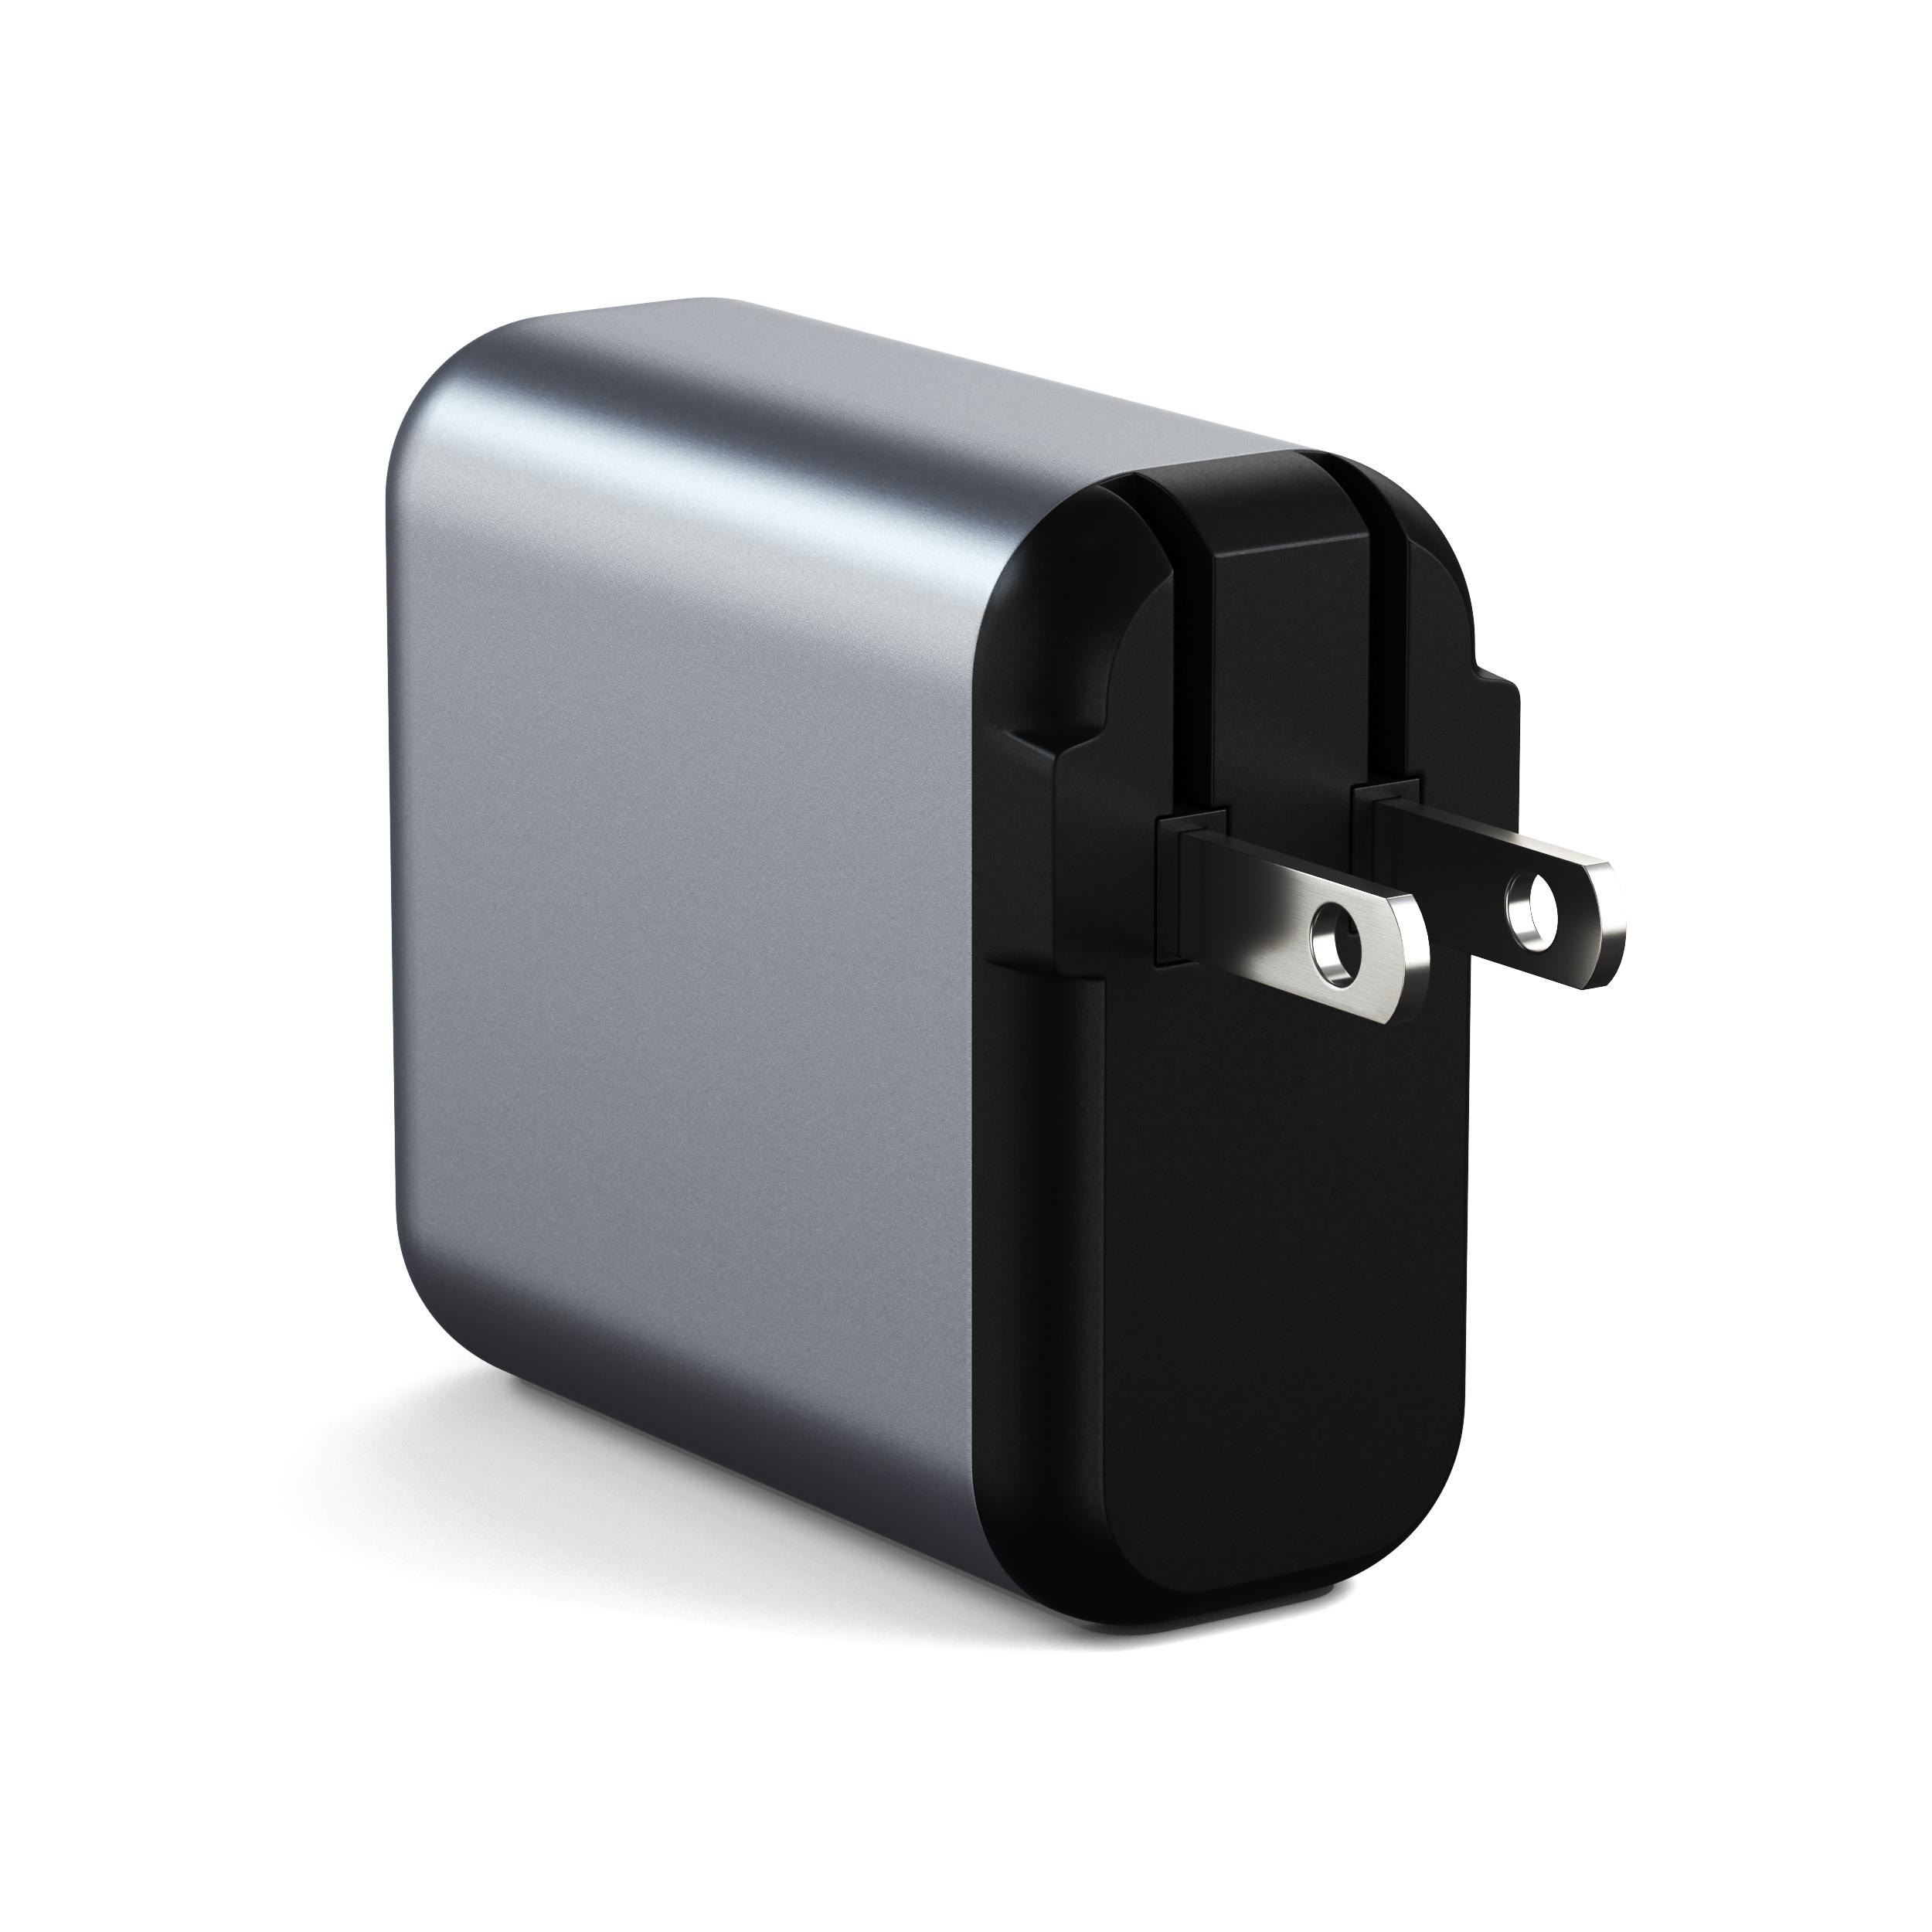 USB-C charger MacBook iPad iPhone